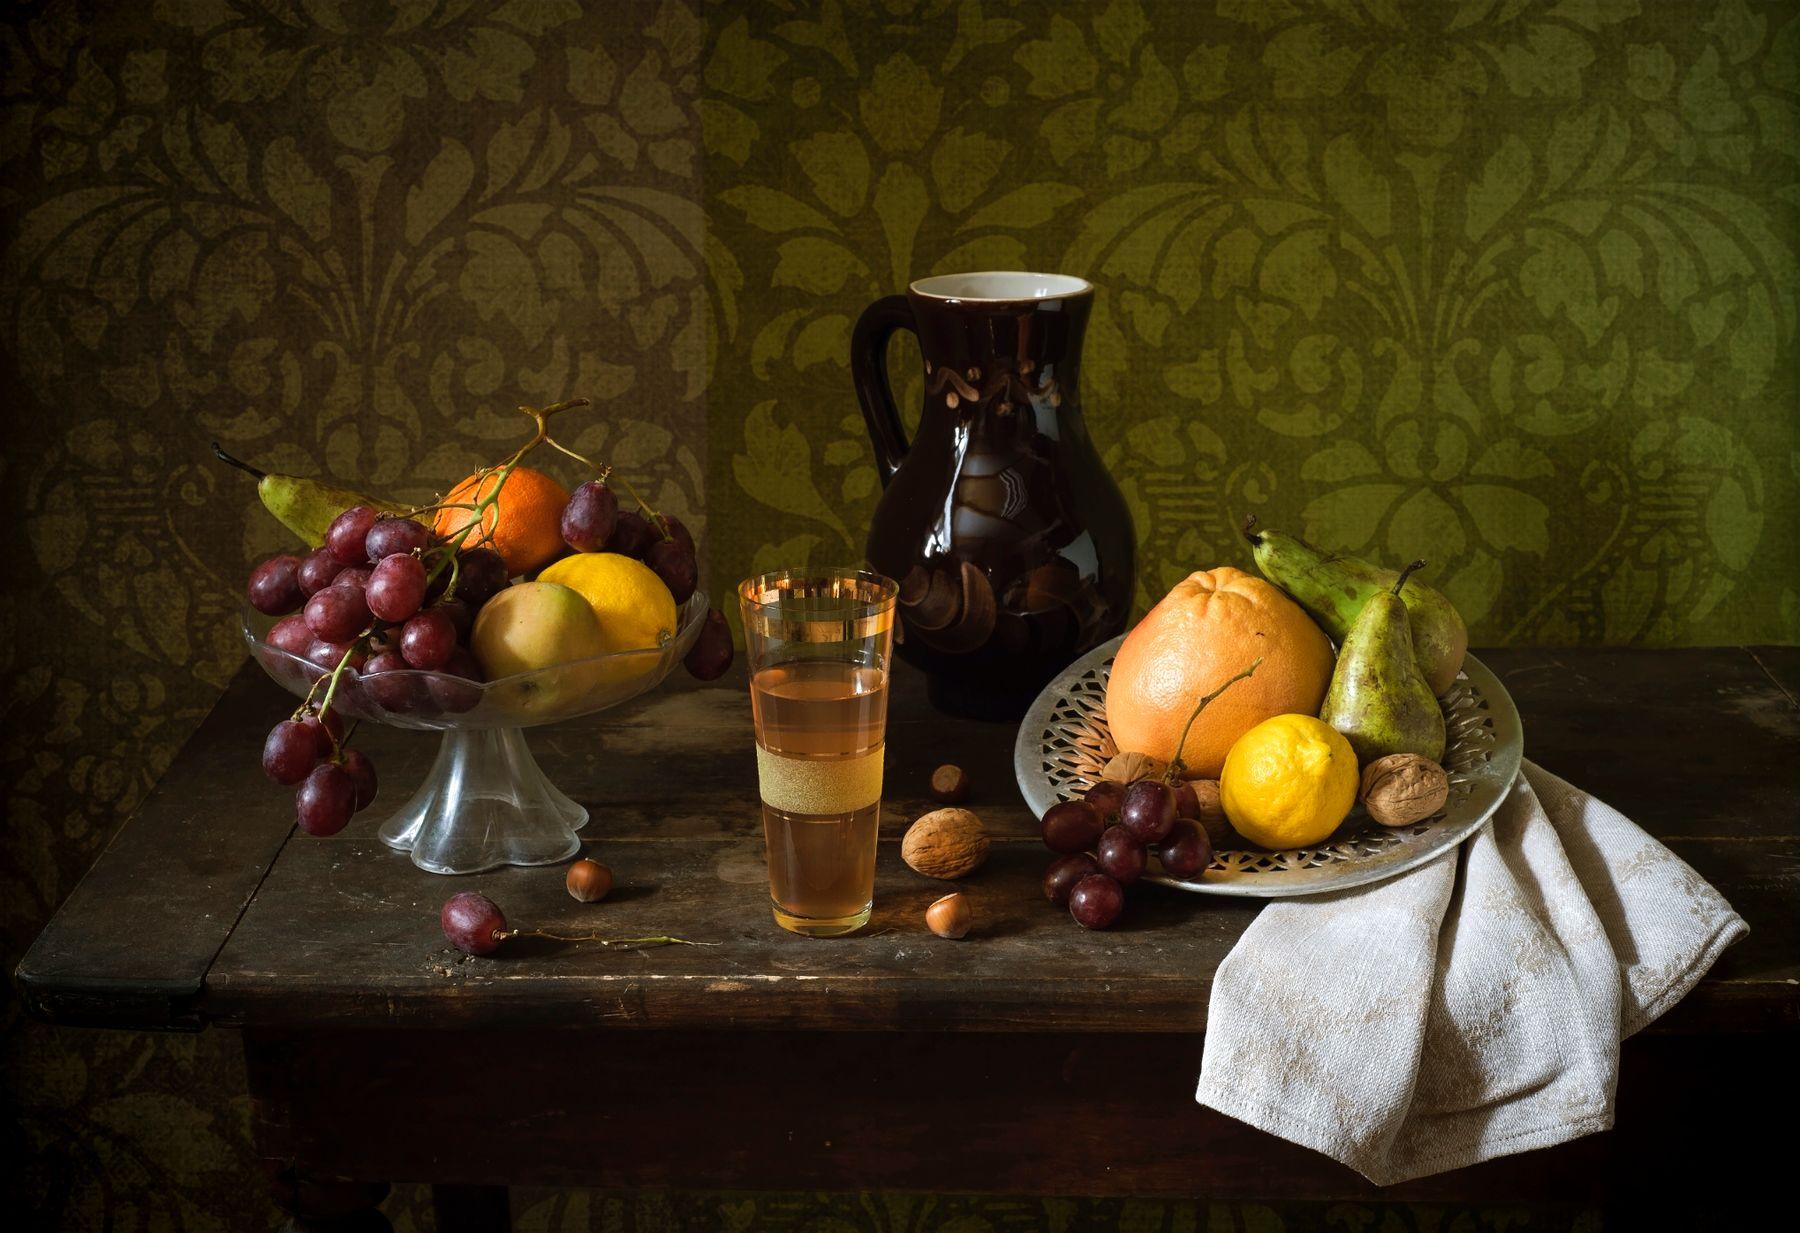 Натюрморт с фруктами. Кувшин виноград груши грейпфрут лимон стакан фрукты